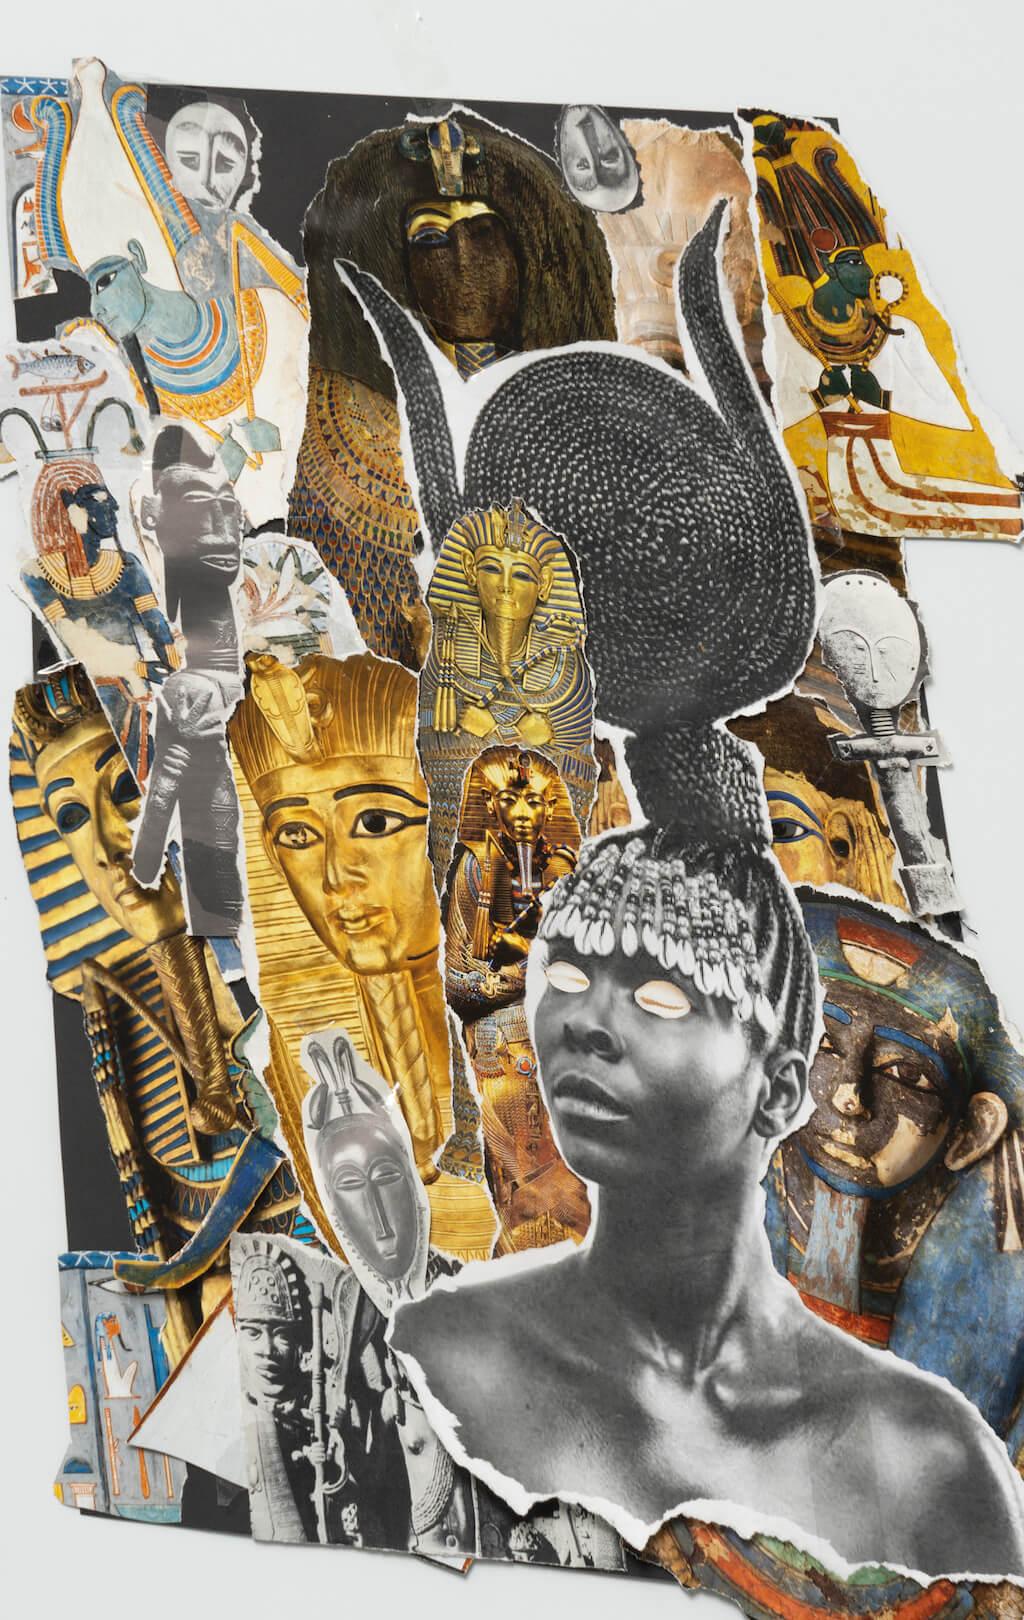 Exocé Kasongo, She remember, print on demand, 2021